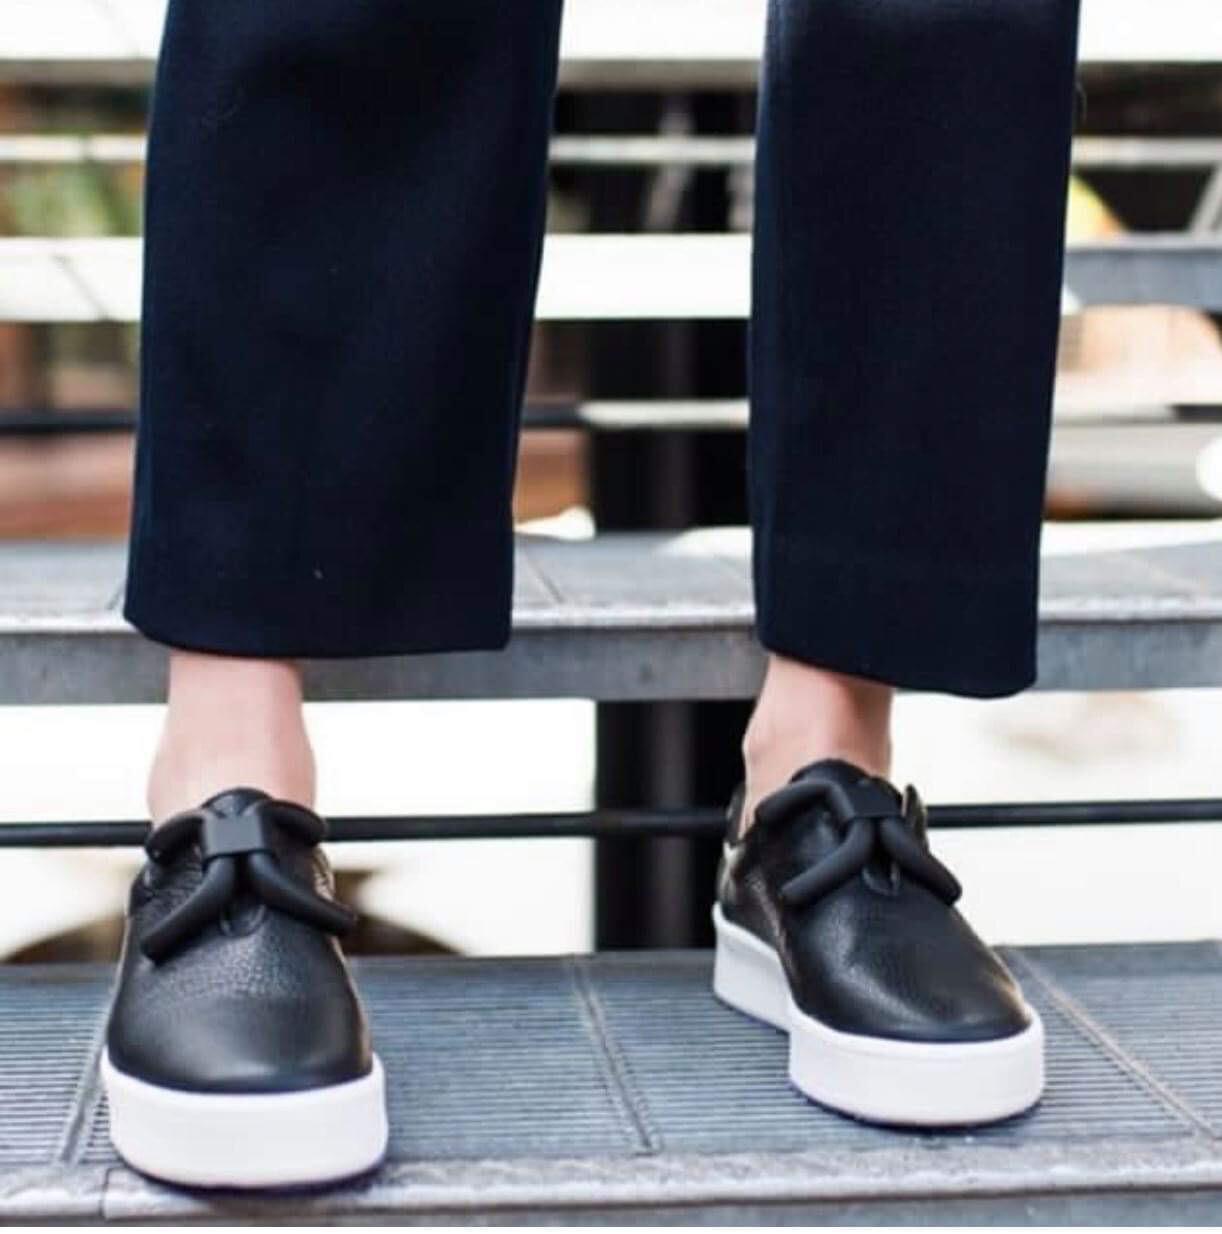 Luxe Buckle Sneaker - Black & Black